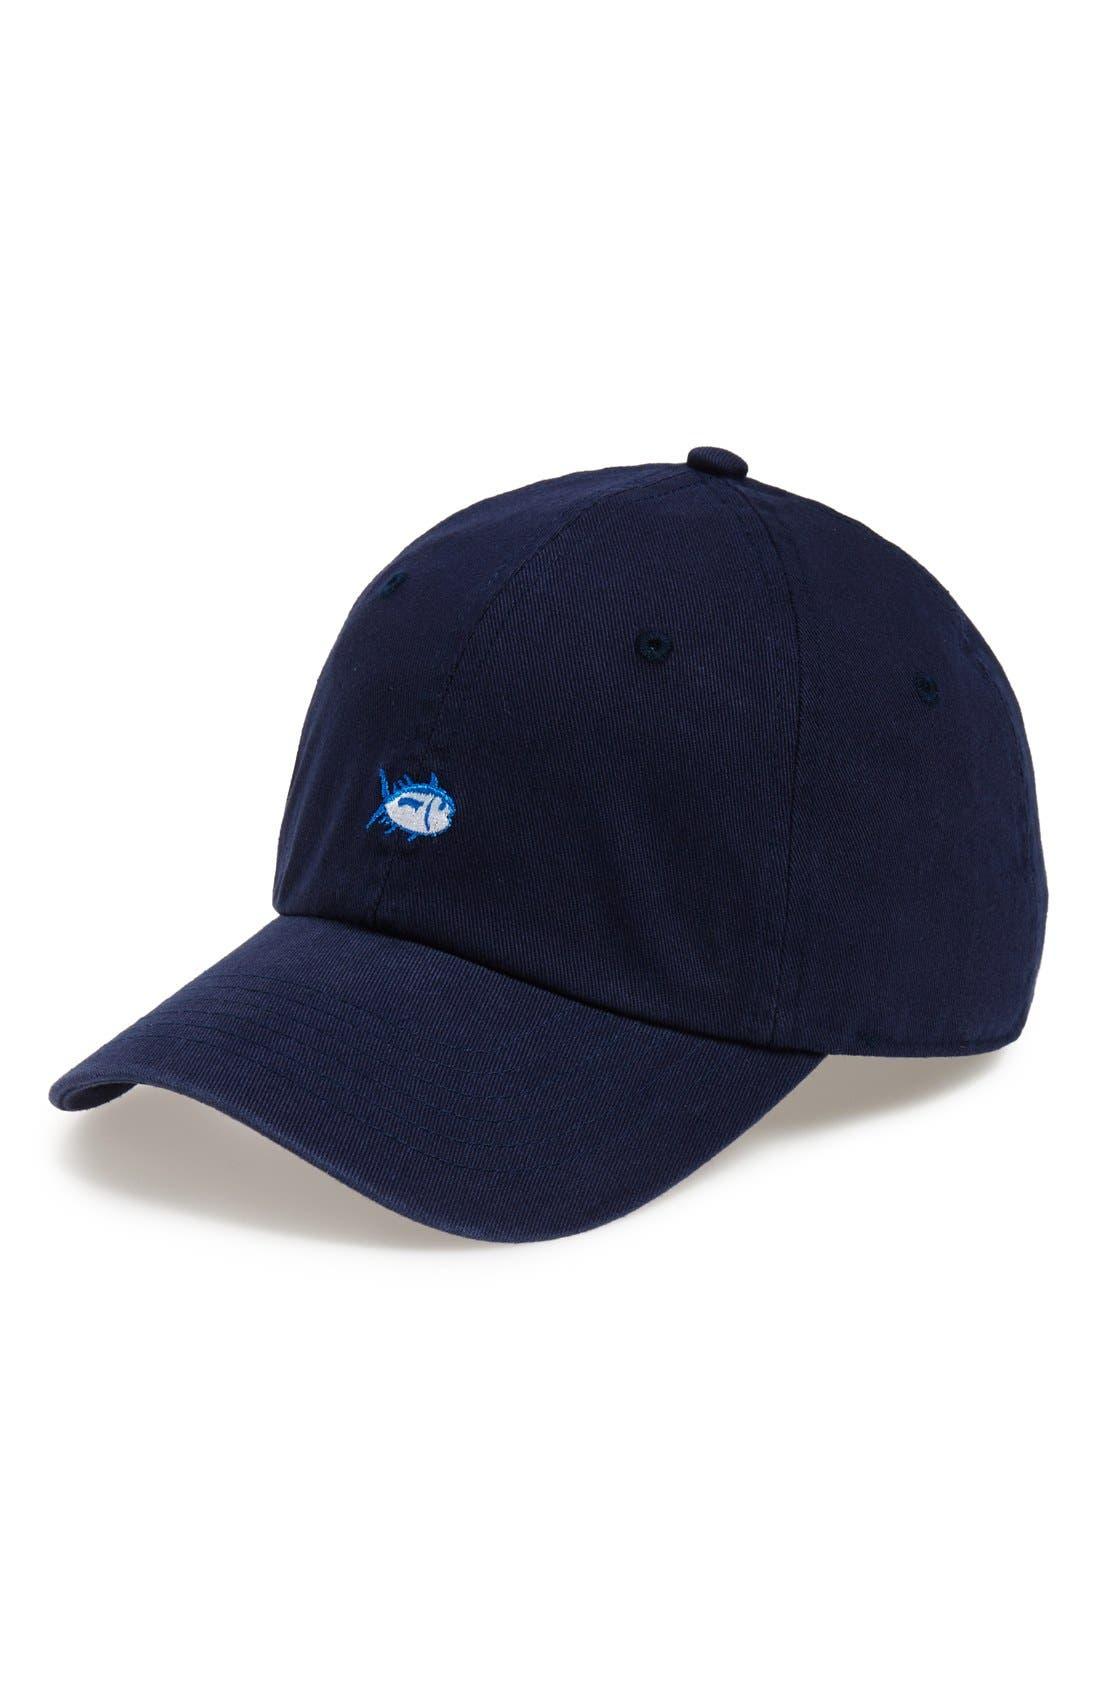 Main Image - Southern Tide 'Mini Skipjack' Hat